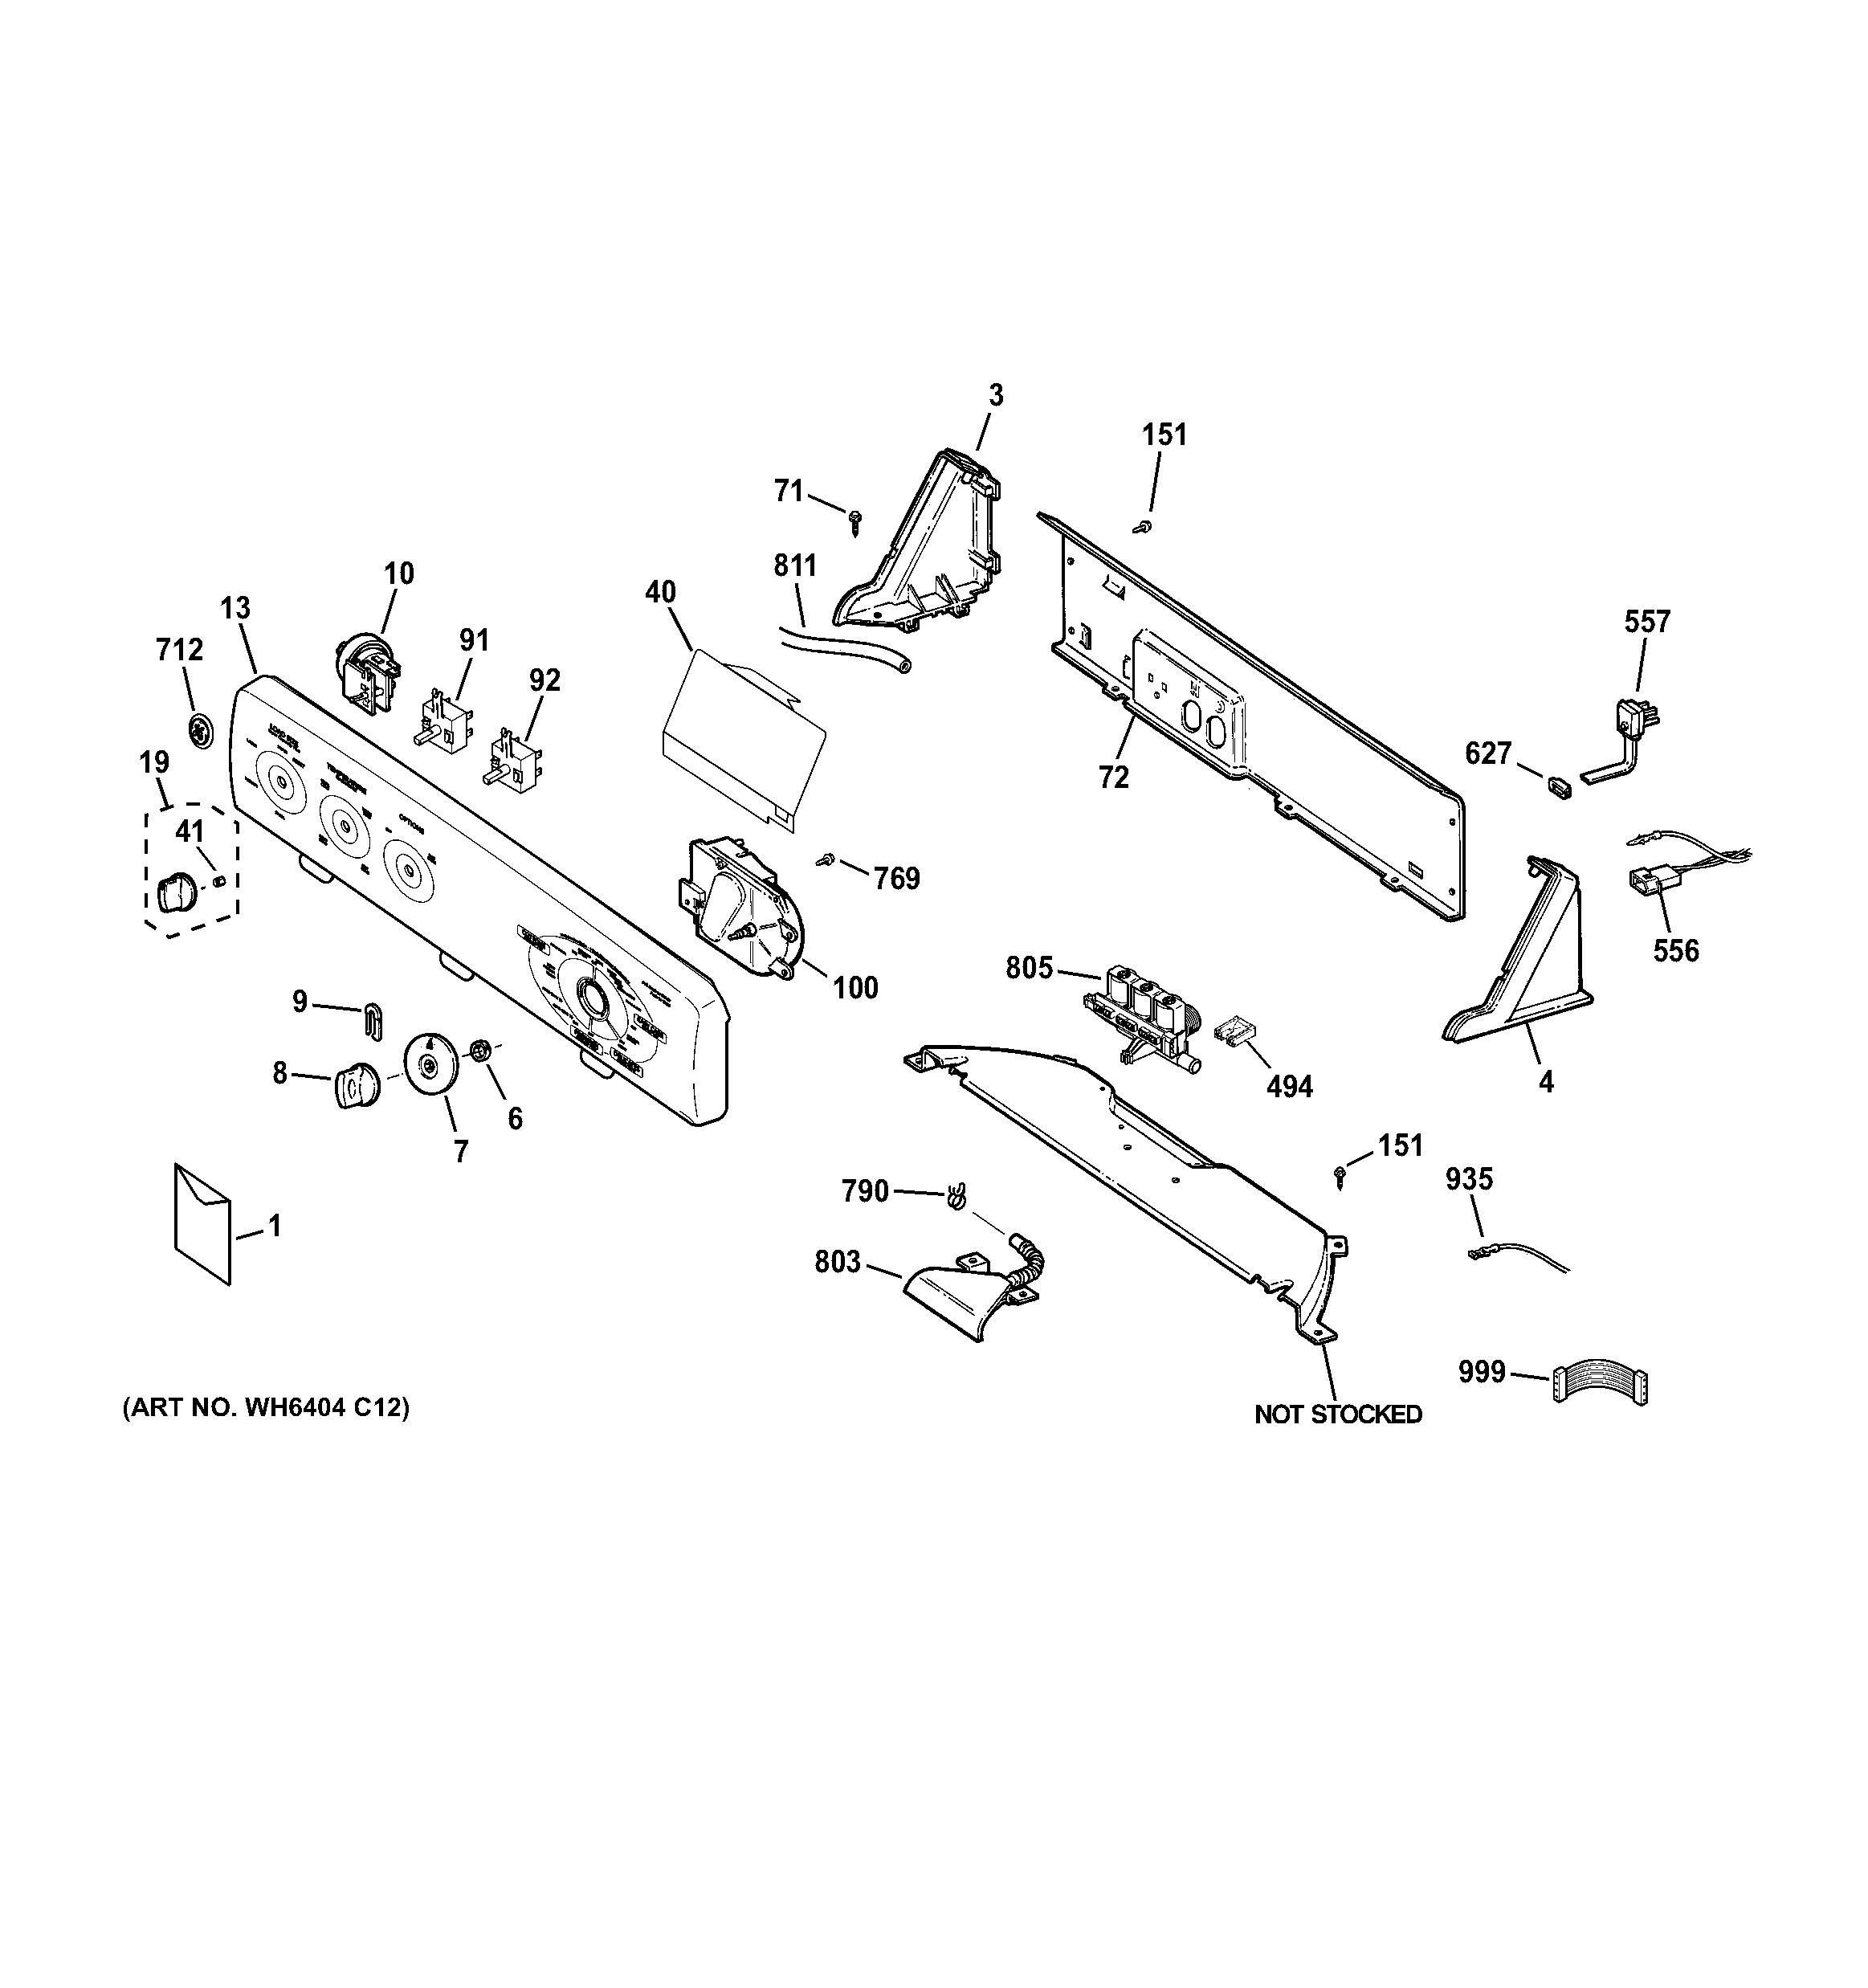 Steering Suspension Diagram Ge Model Gban2800f0ww Residential Washers Genuine Parts Of Steering Suspension Diagram